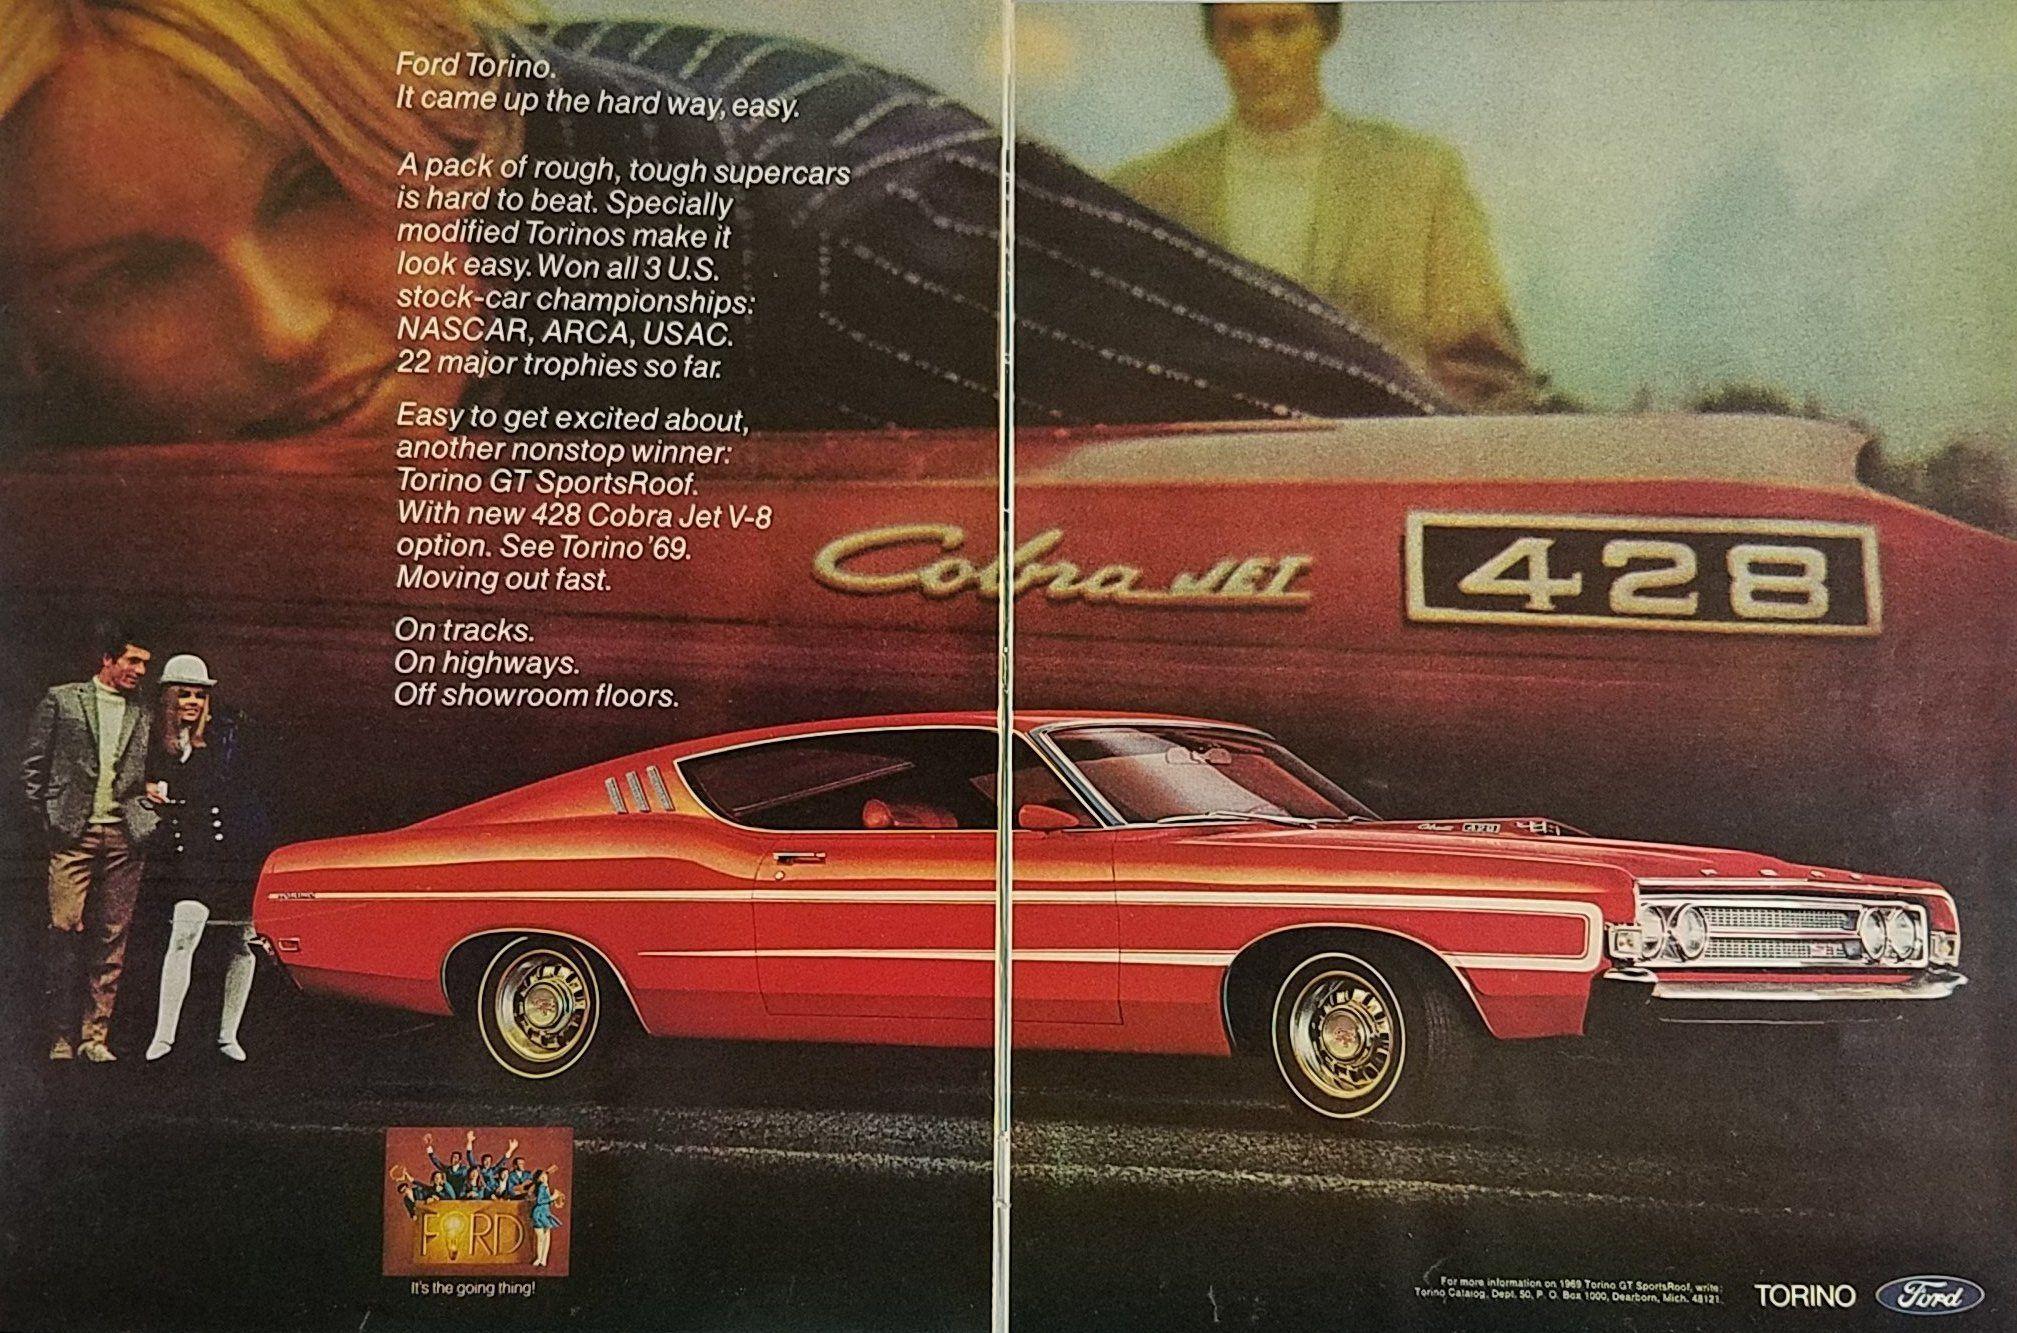 1964 Ford Fairlane Cobra Jet Vintage Advertisement Ad